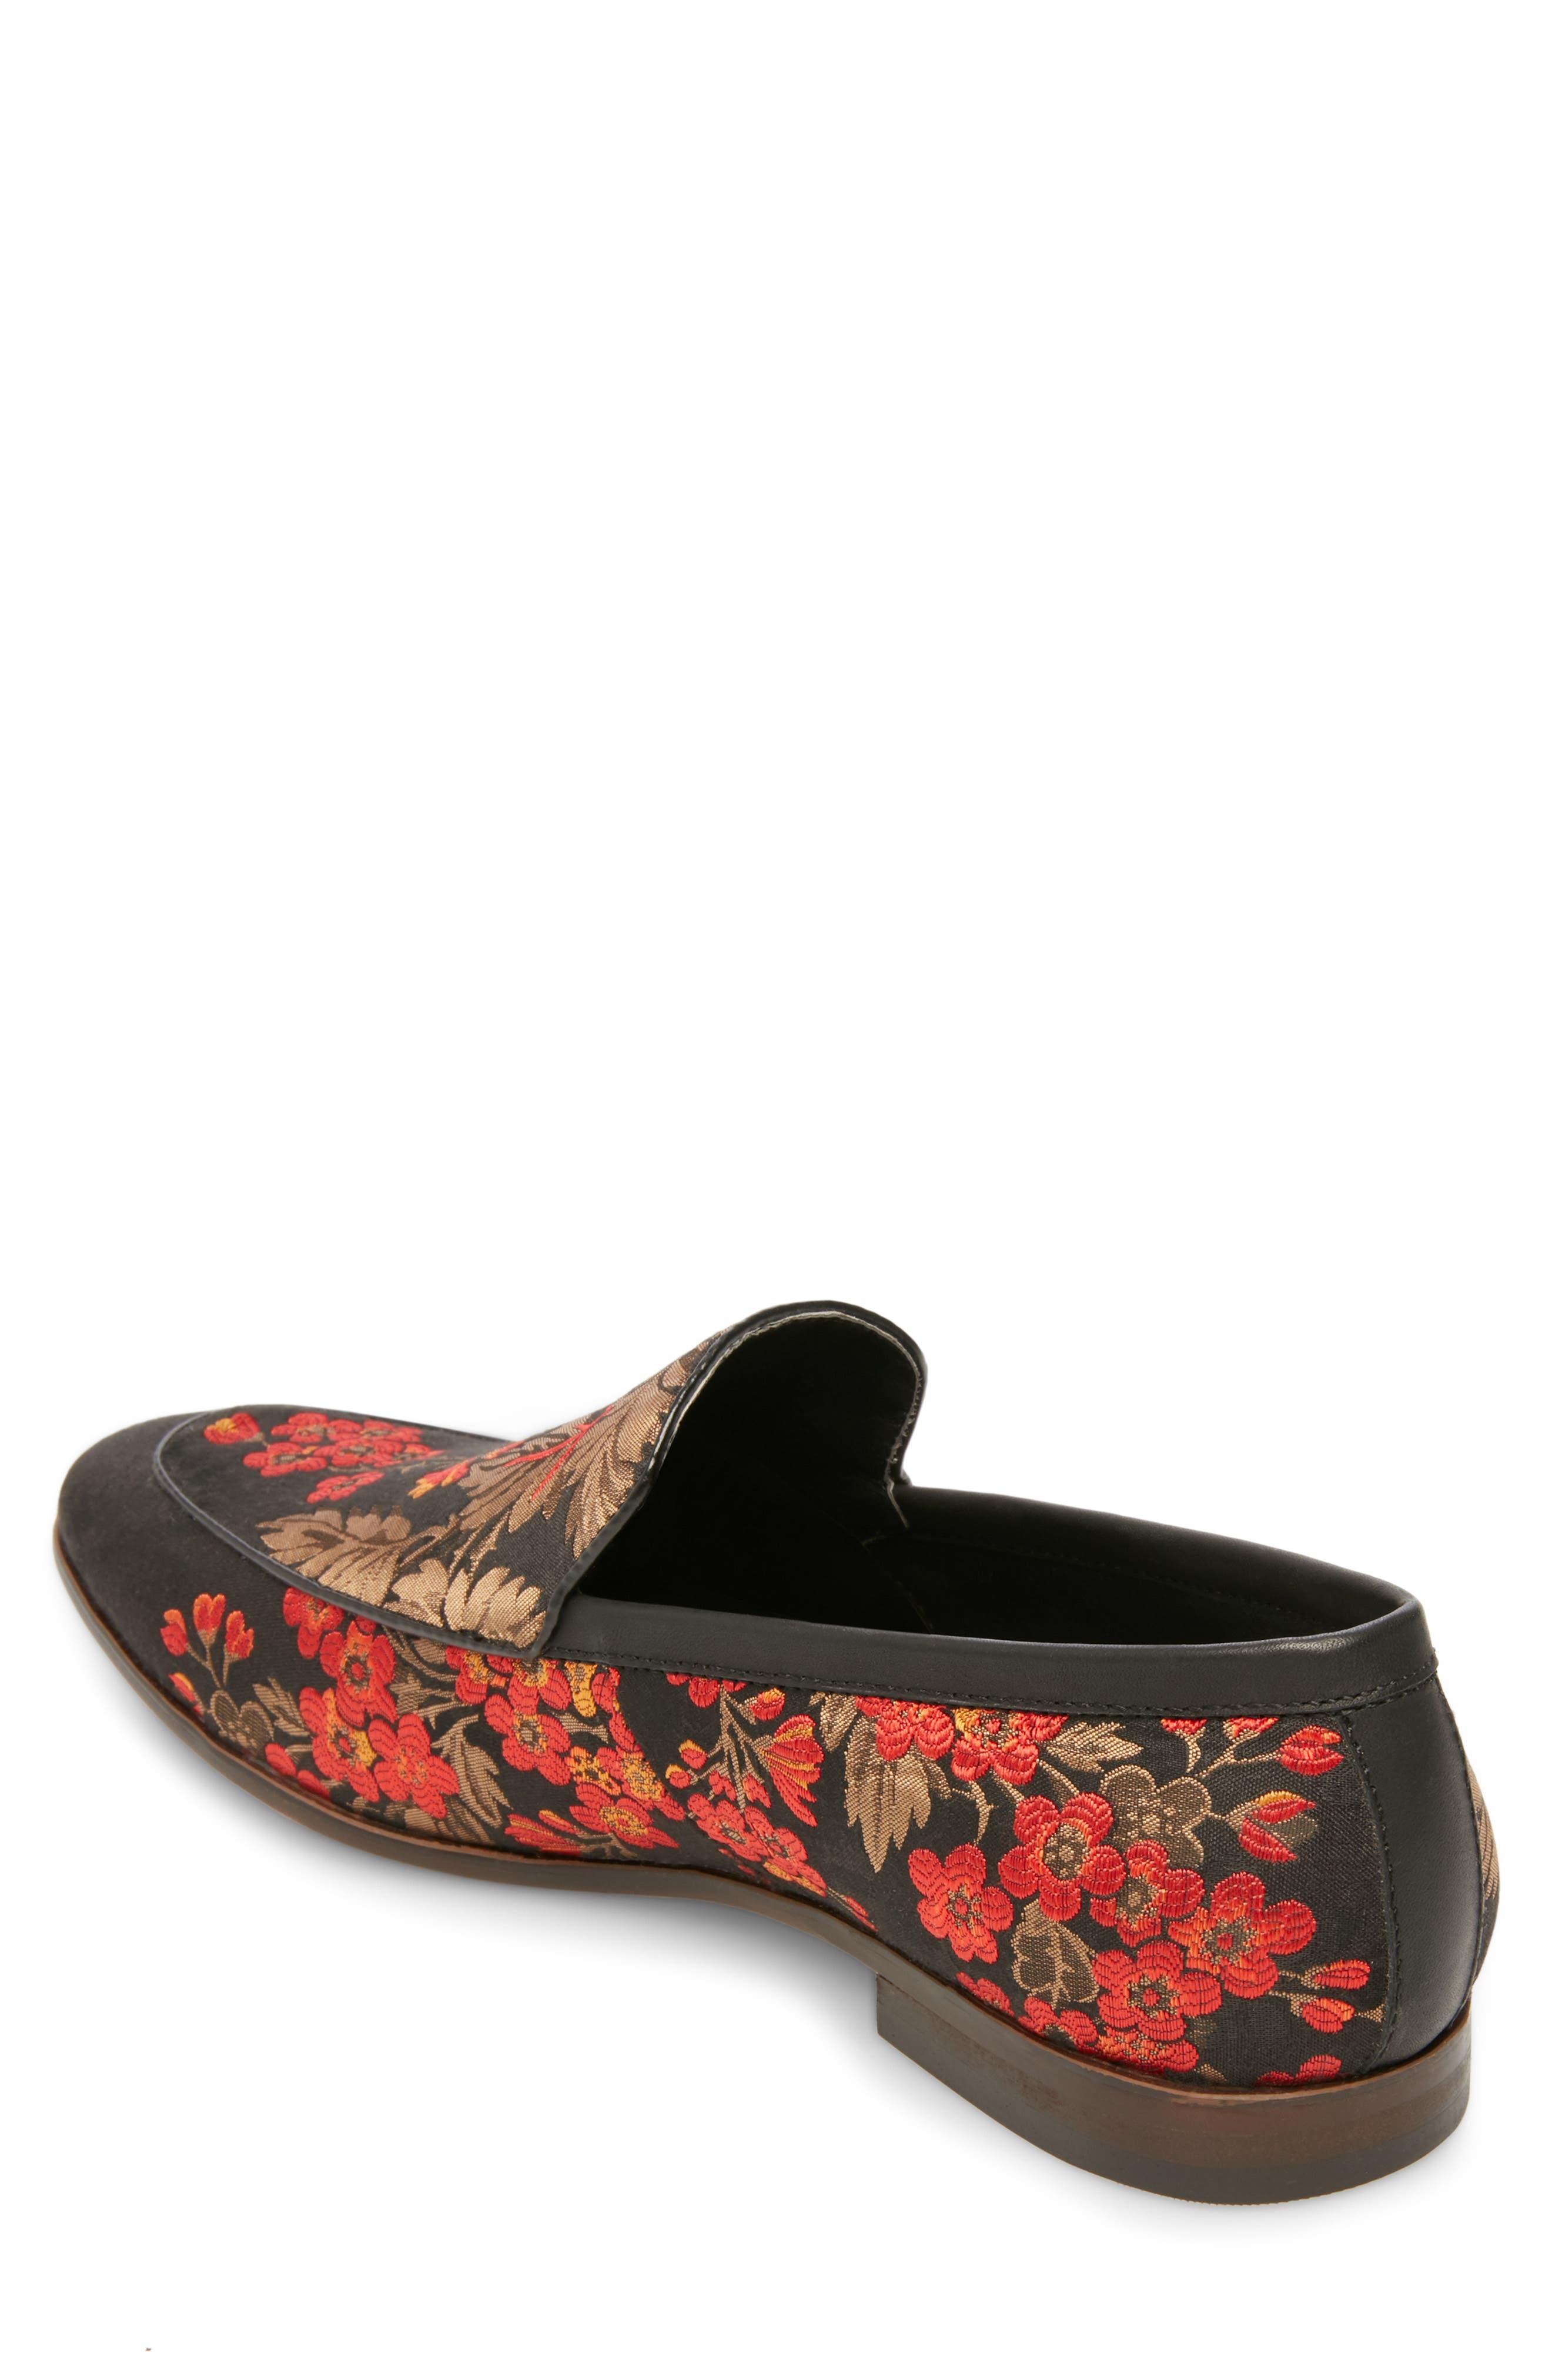 Duplex Apron Toe Venetian Loafer,                             Alternate thumbnail 2, color,                             BLACK/ RED